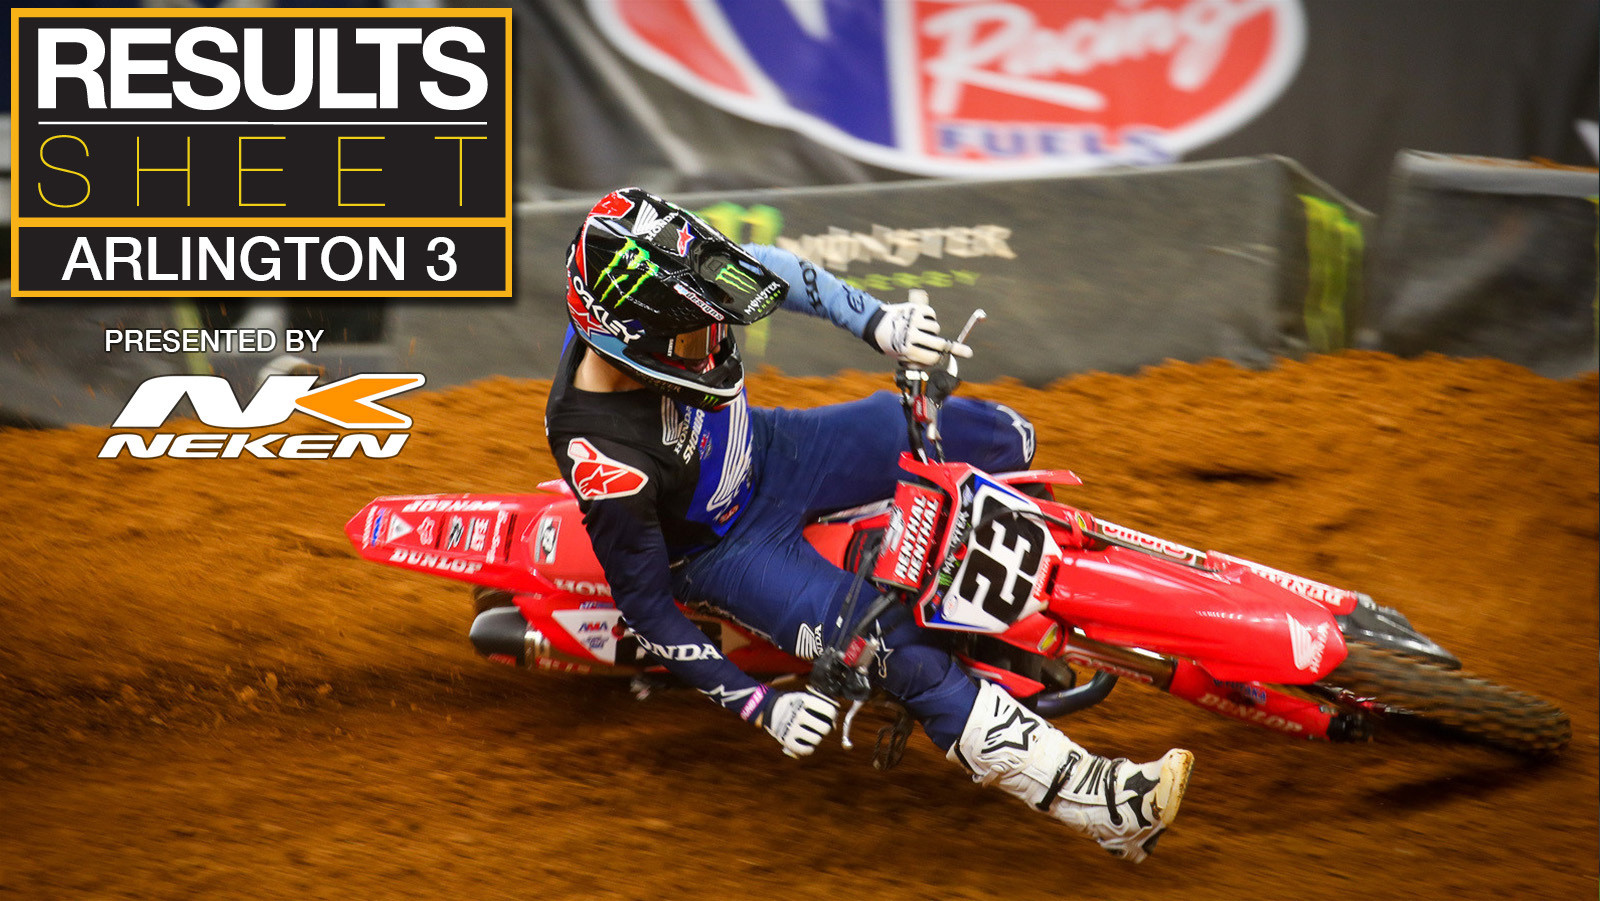 Results Sheet: 2021 Arlington 3 Supercross